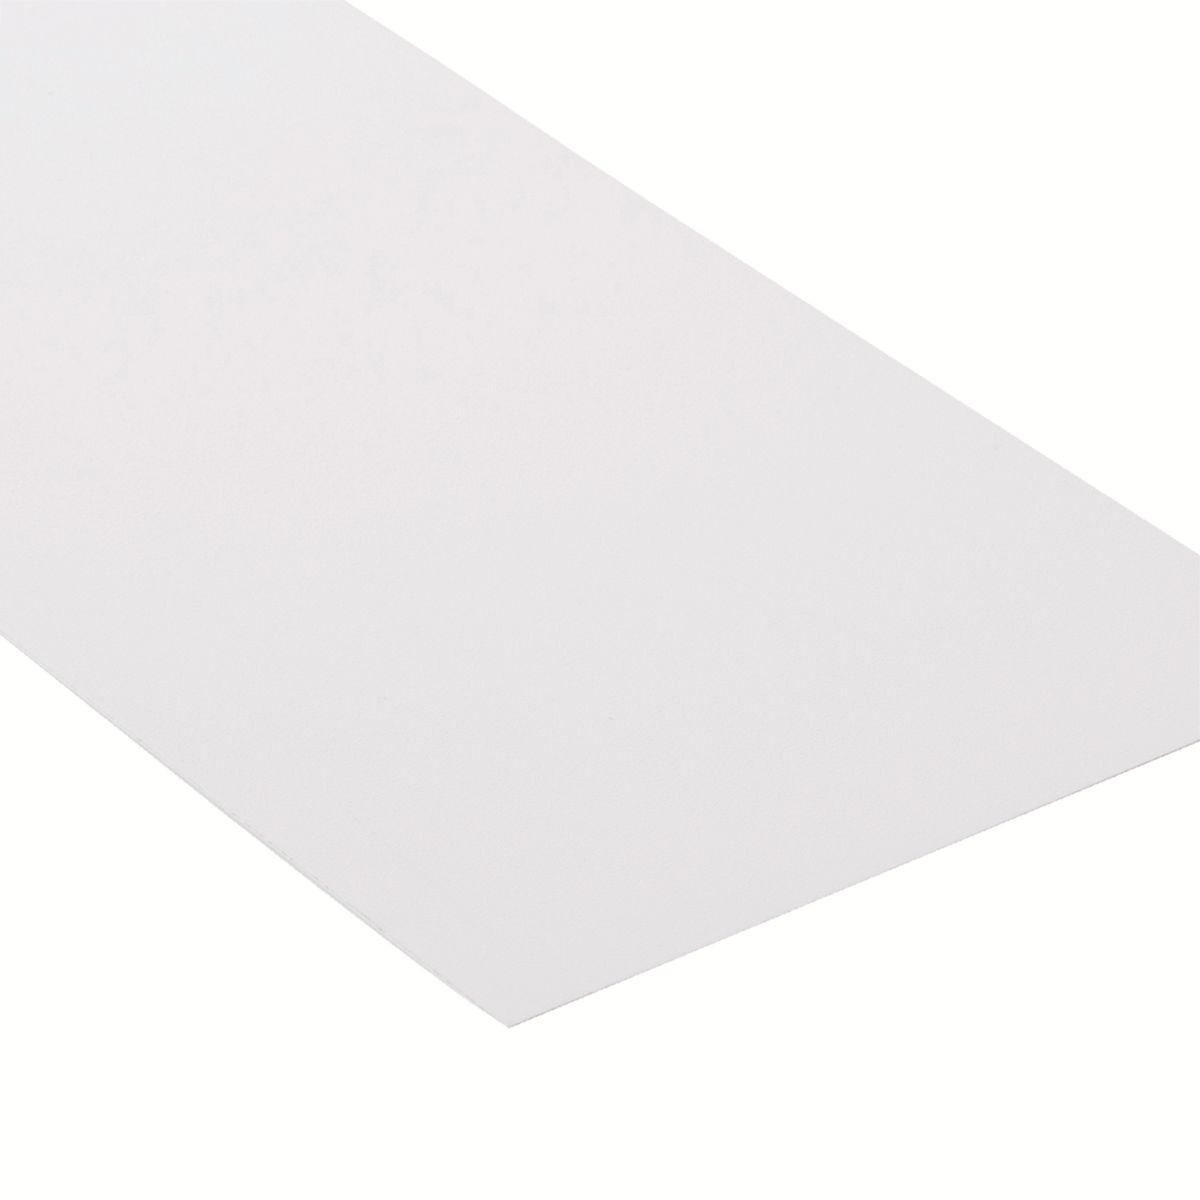 Lastra Polipropilene Nero 1000 X 500 Mm Spessore 1 Mm Prezzi E  ~ Laminas De Metacrilato Leroy Merlin